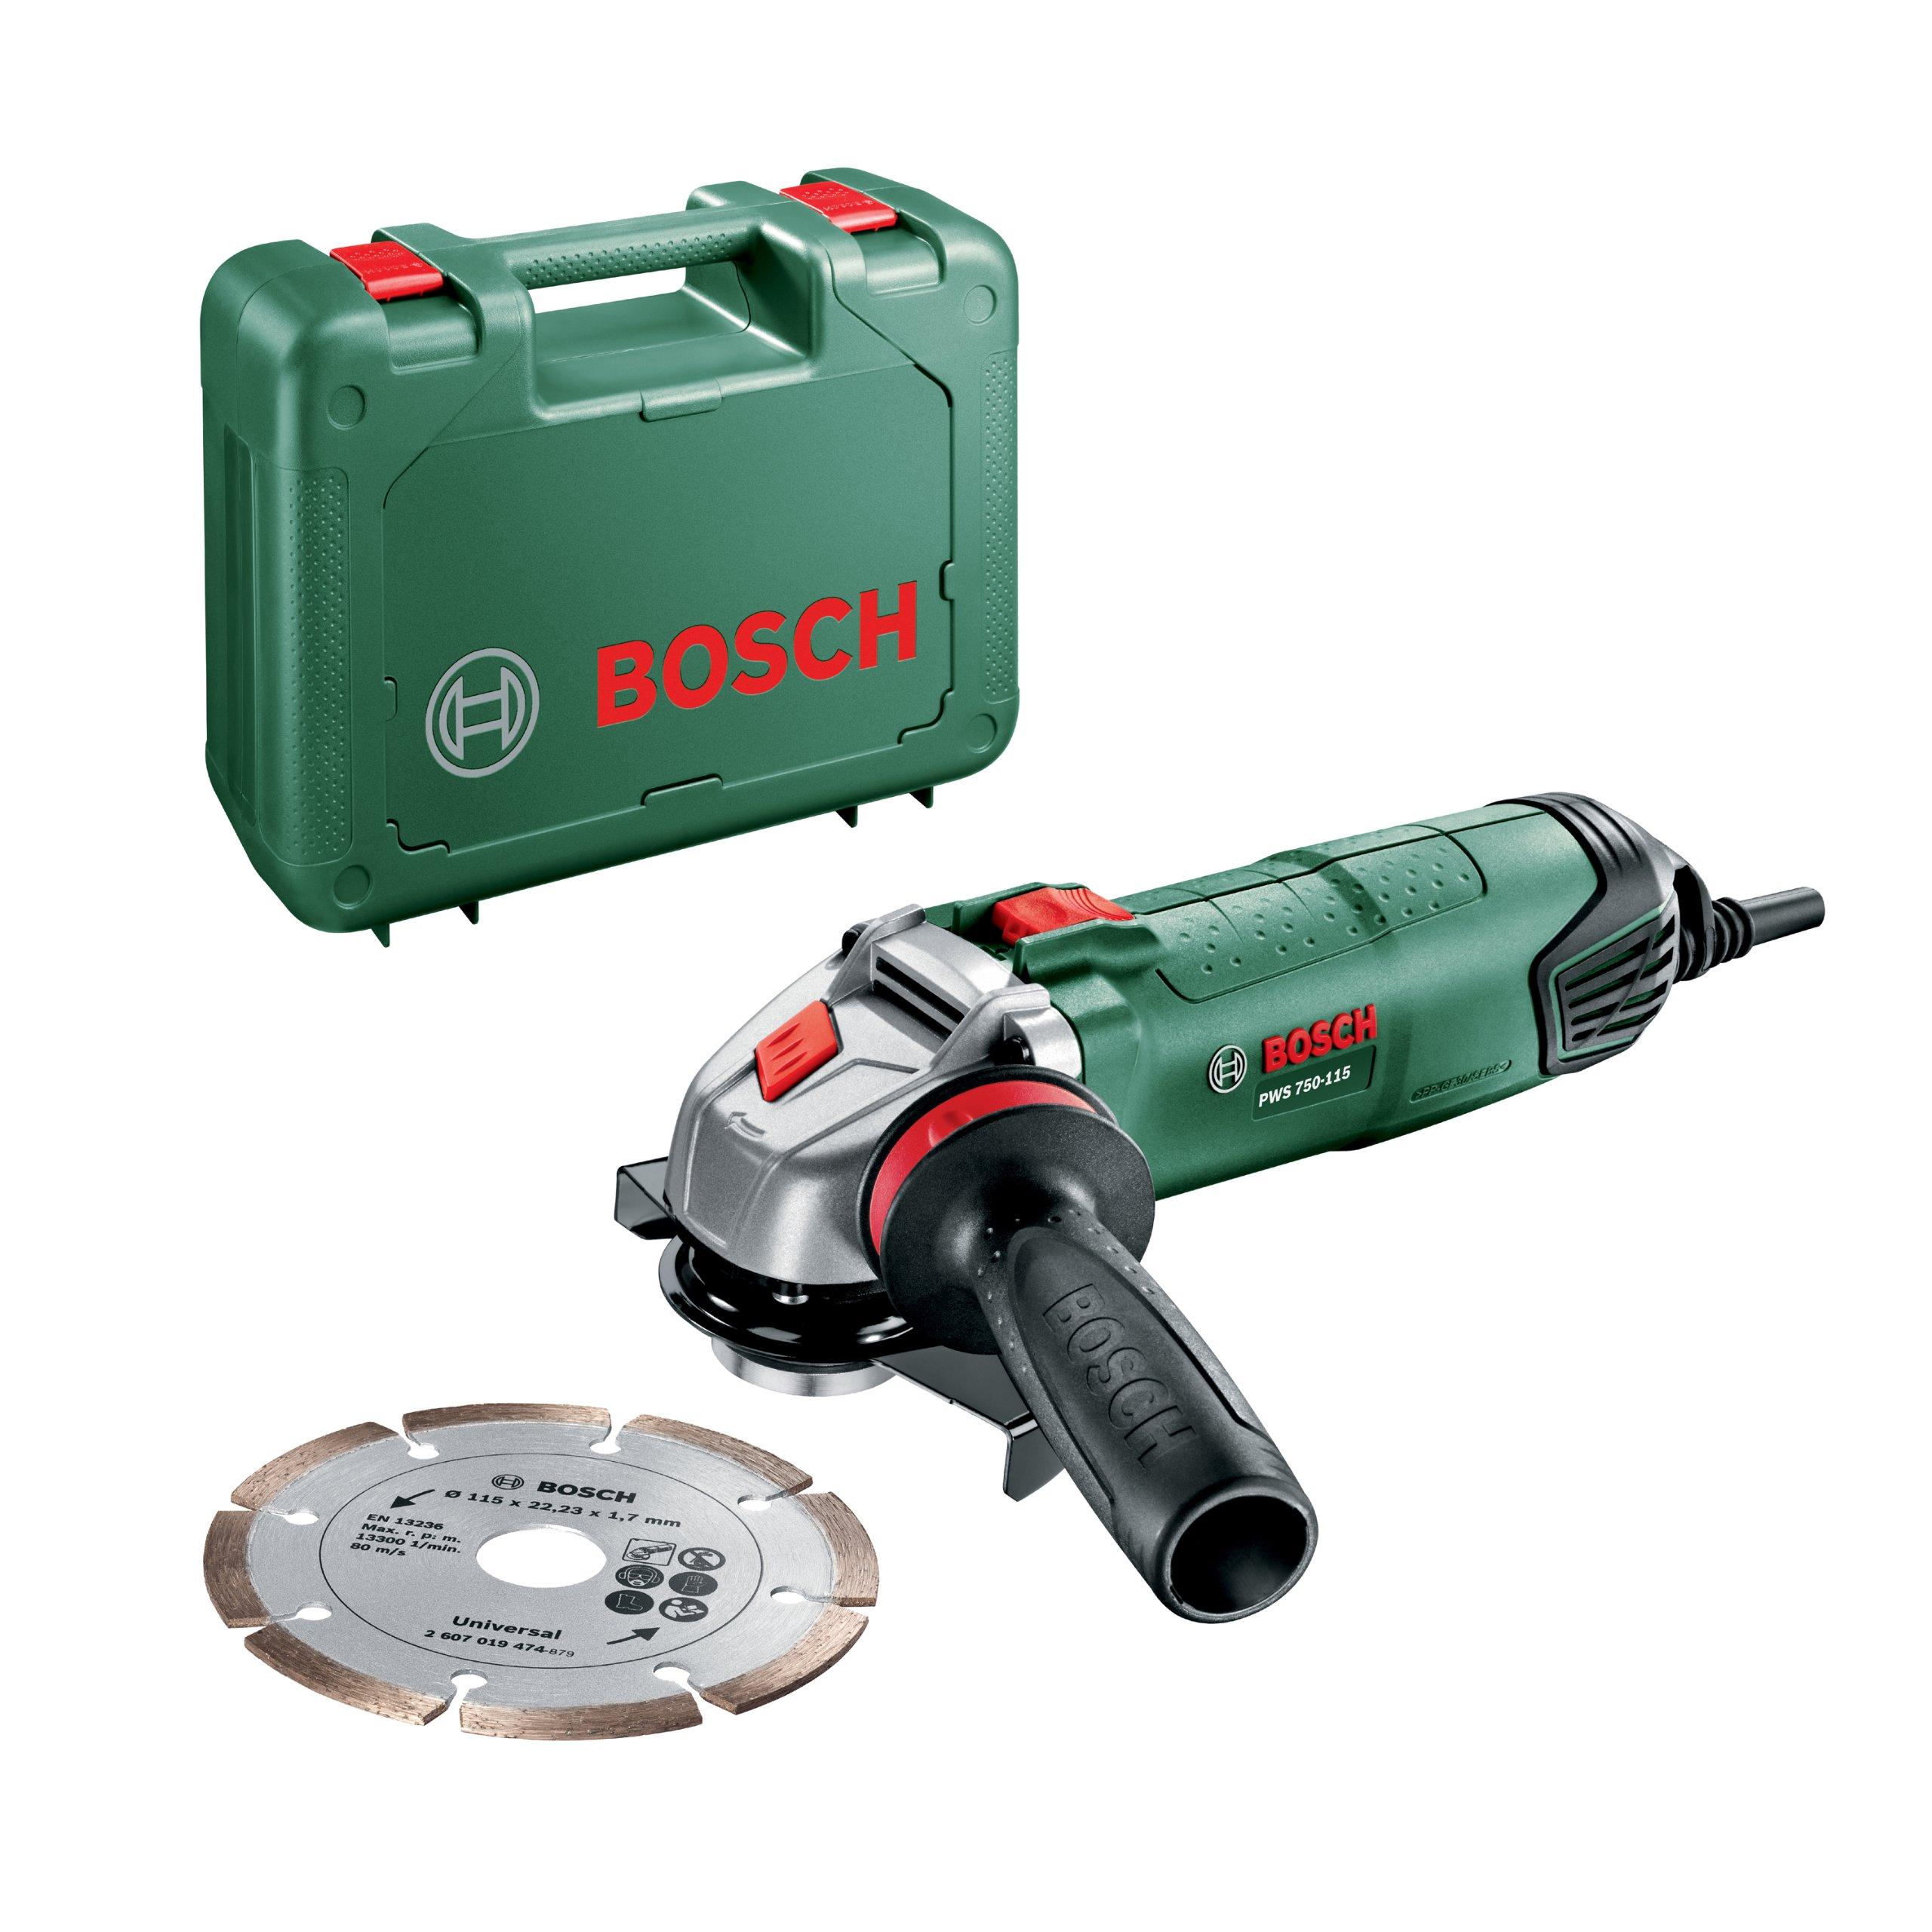 Bosch PWS 750-115 Smerigliatrice Angolare, Sistema Dust Protection, Valigetta product image